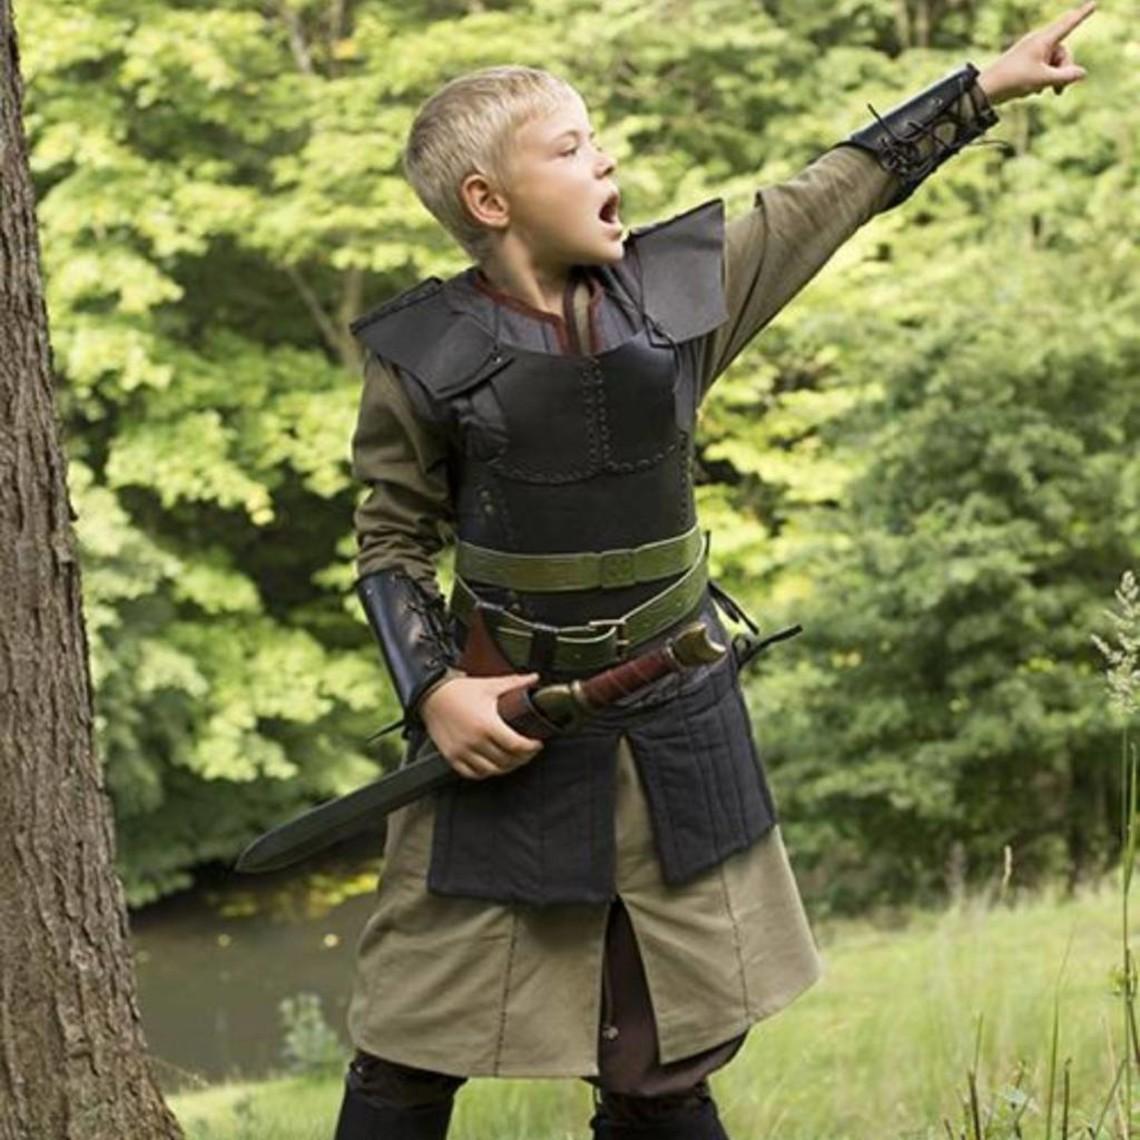 Epic Armoury RFB leather vambraces, black, pair